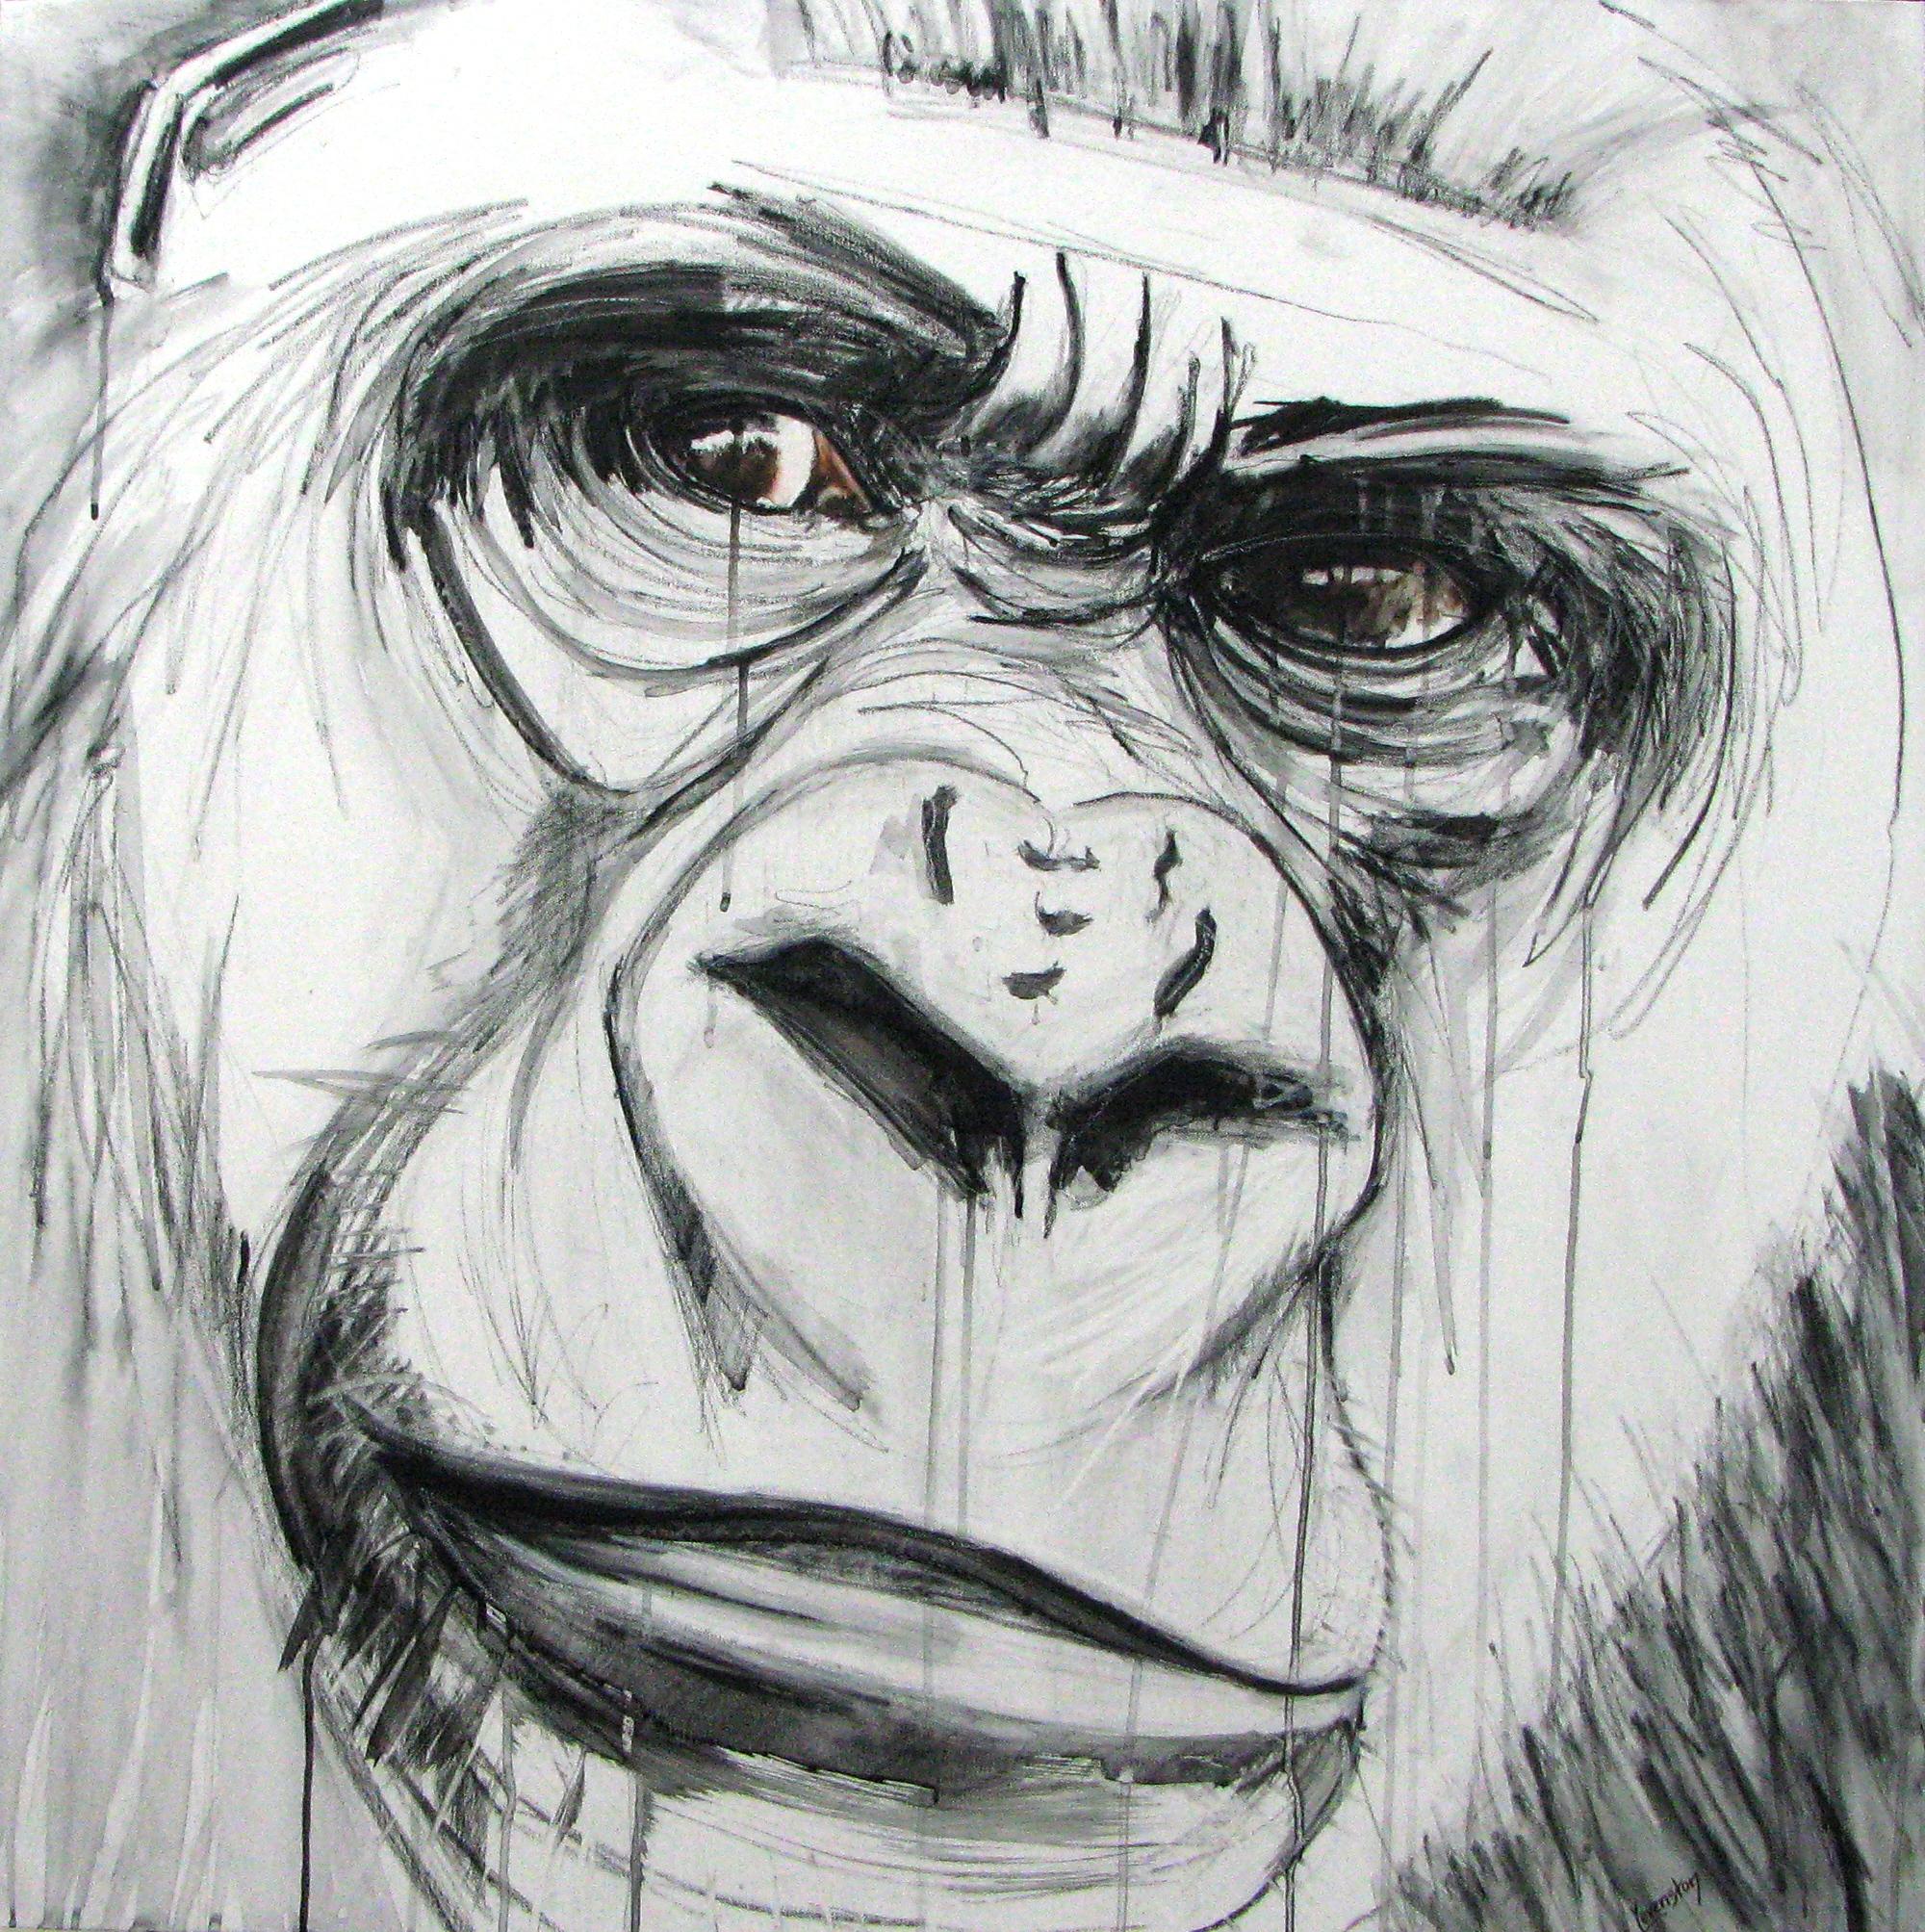 Gorilla_Talk 2 me!.jpg